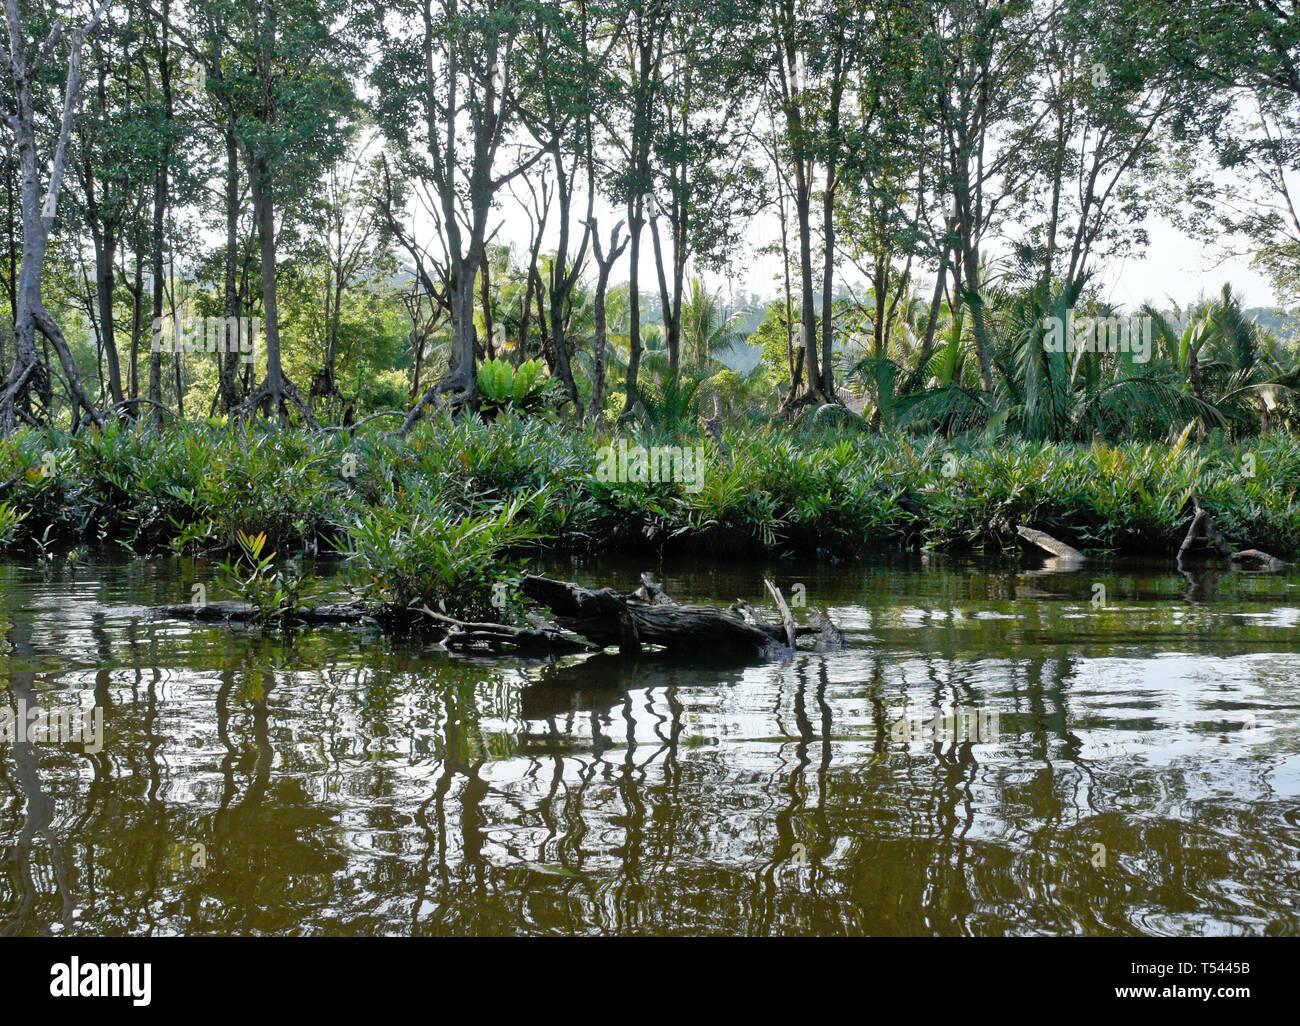 Vegetation in Pulau Ranggu area along Brunei River near Bandar Seri Begawan, Sultanate of Brunei - Stock Image